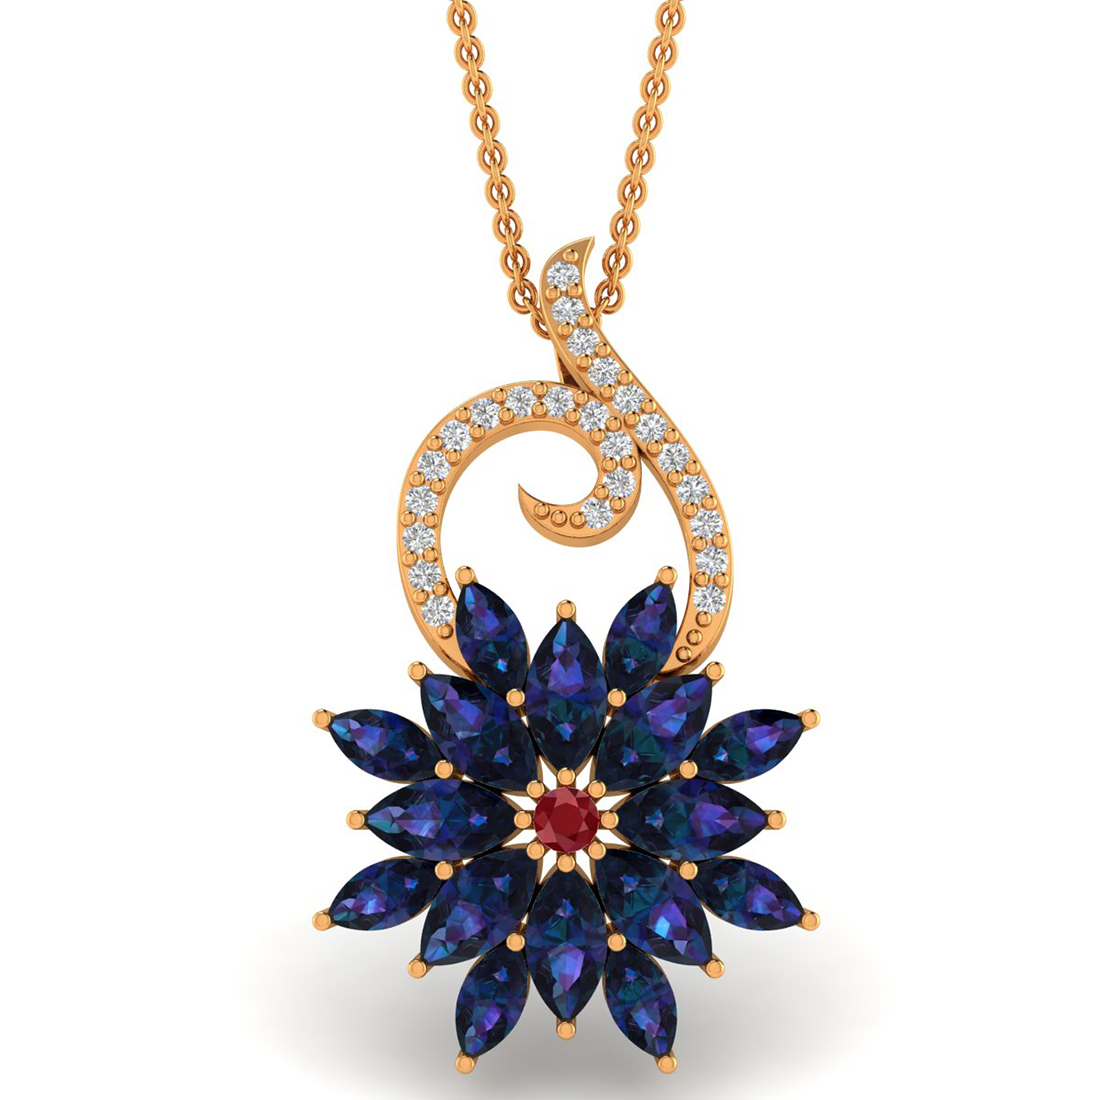 Diamond Pendant with Ruby & Blue Sapphire